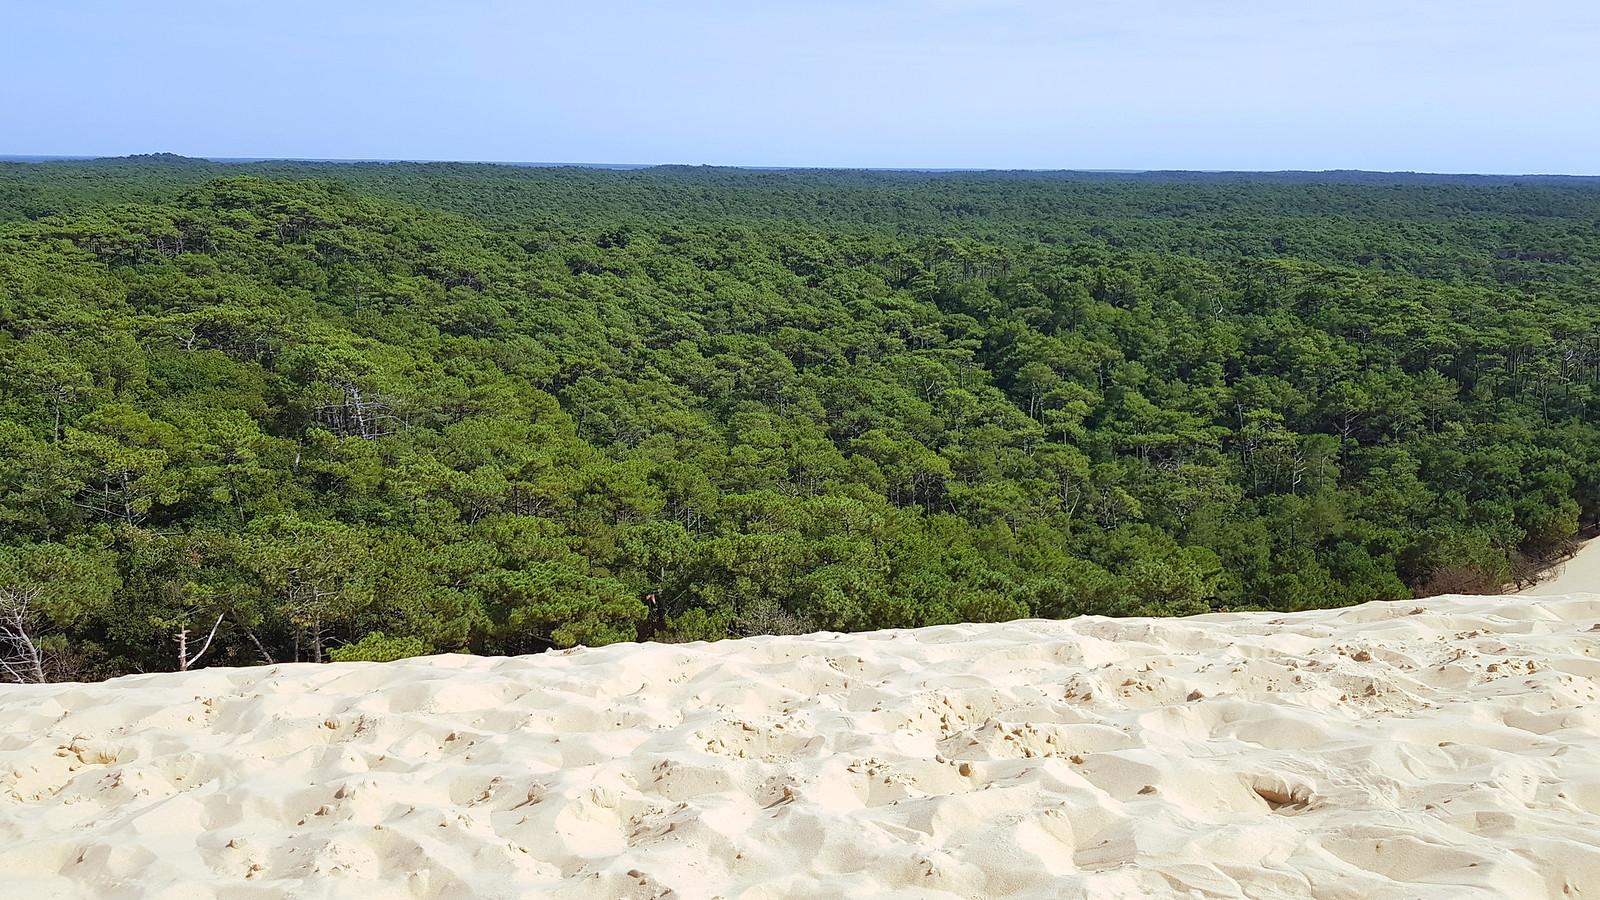 Dune du Pilat Francia Burdeos dune du pilat - 31094139247 77581b4456 h - Dune du Pilat, la duna de arena más alta de Europa